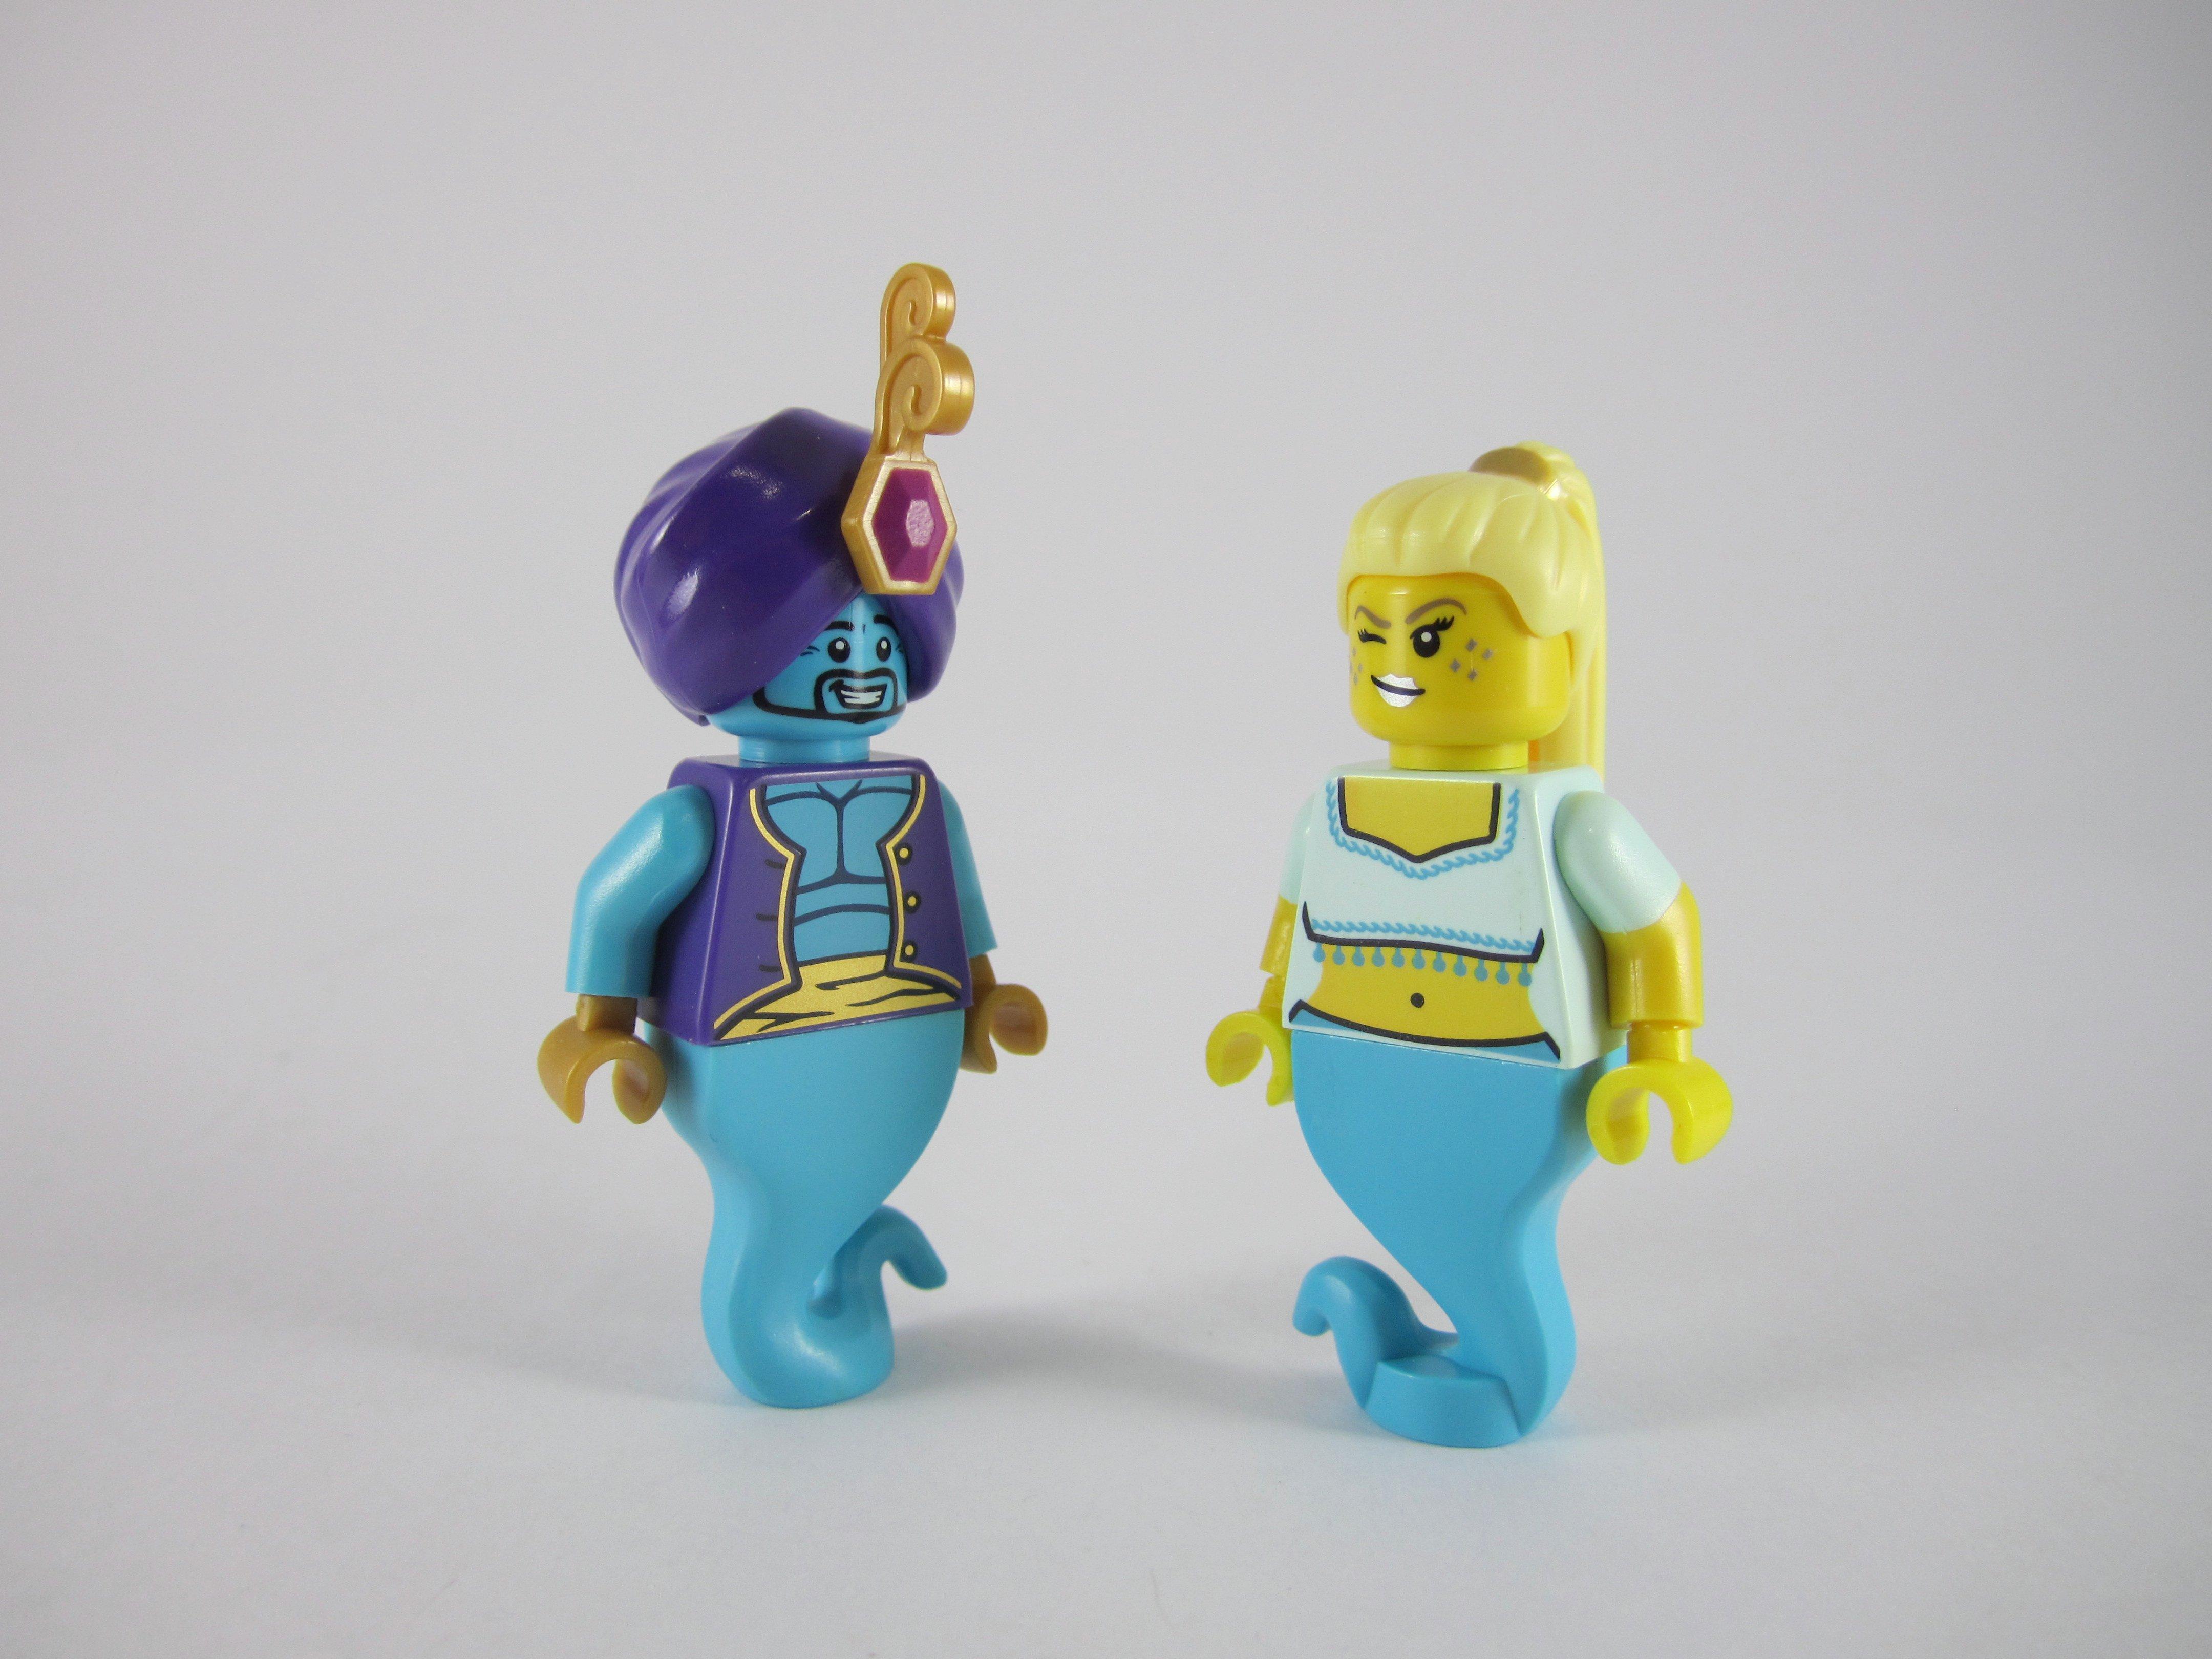 Series 12 lego mini figure DINO TRACKER LADY no bow nor dart LEGO Bau- & Konstruktionsspielzeug